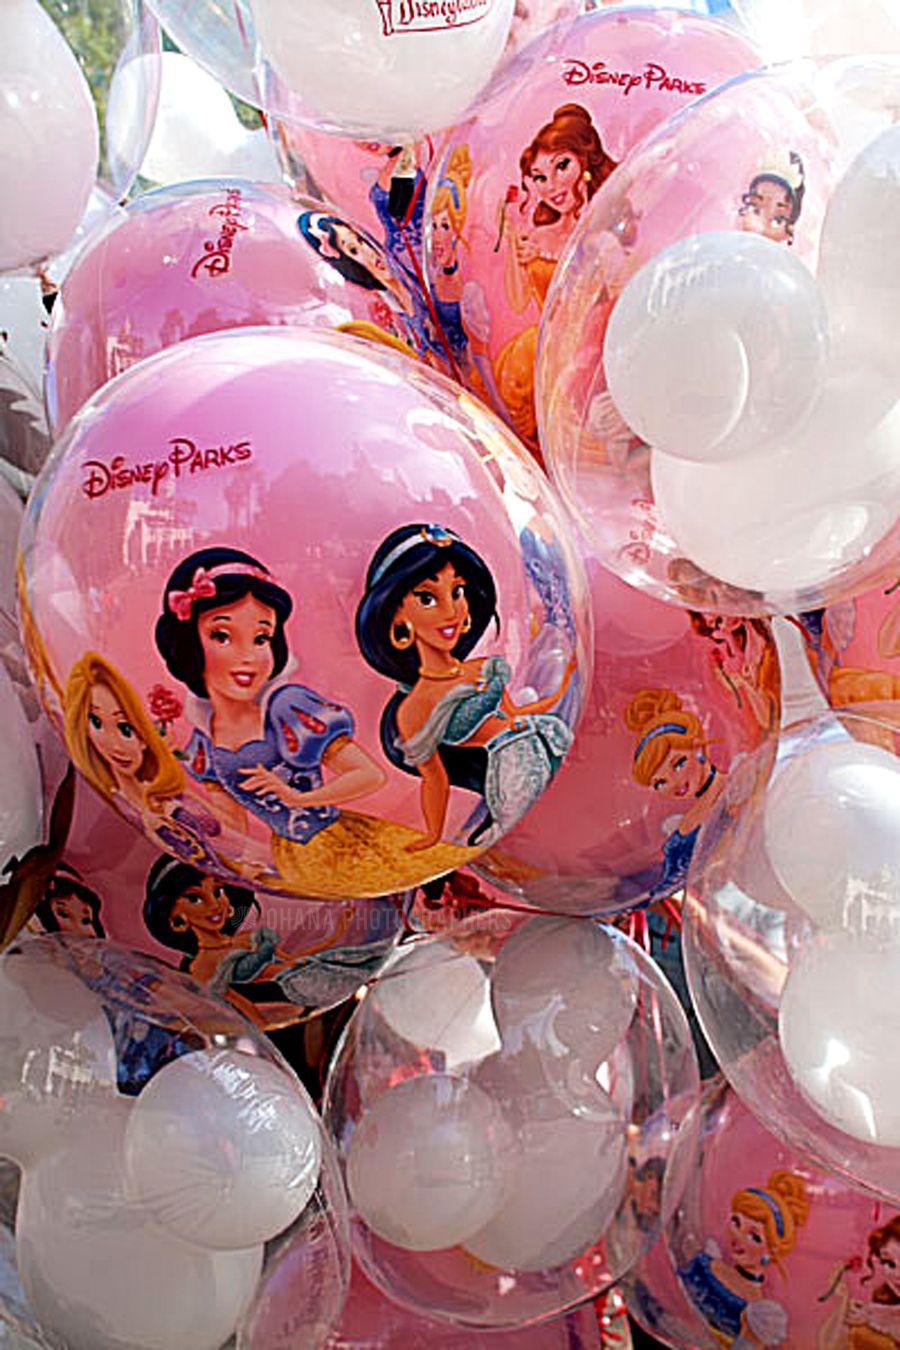 Disneyland // Mickey Mouse and Princess Balloons Disney